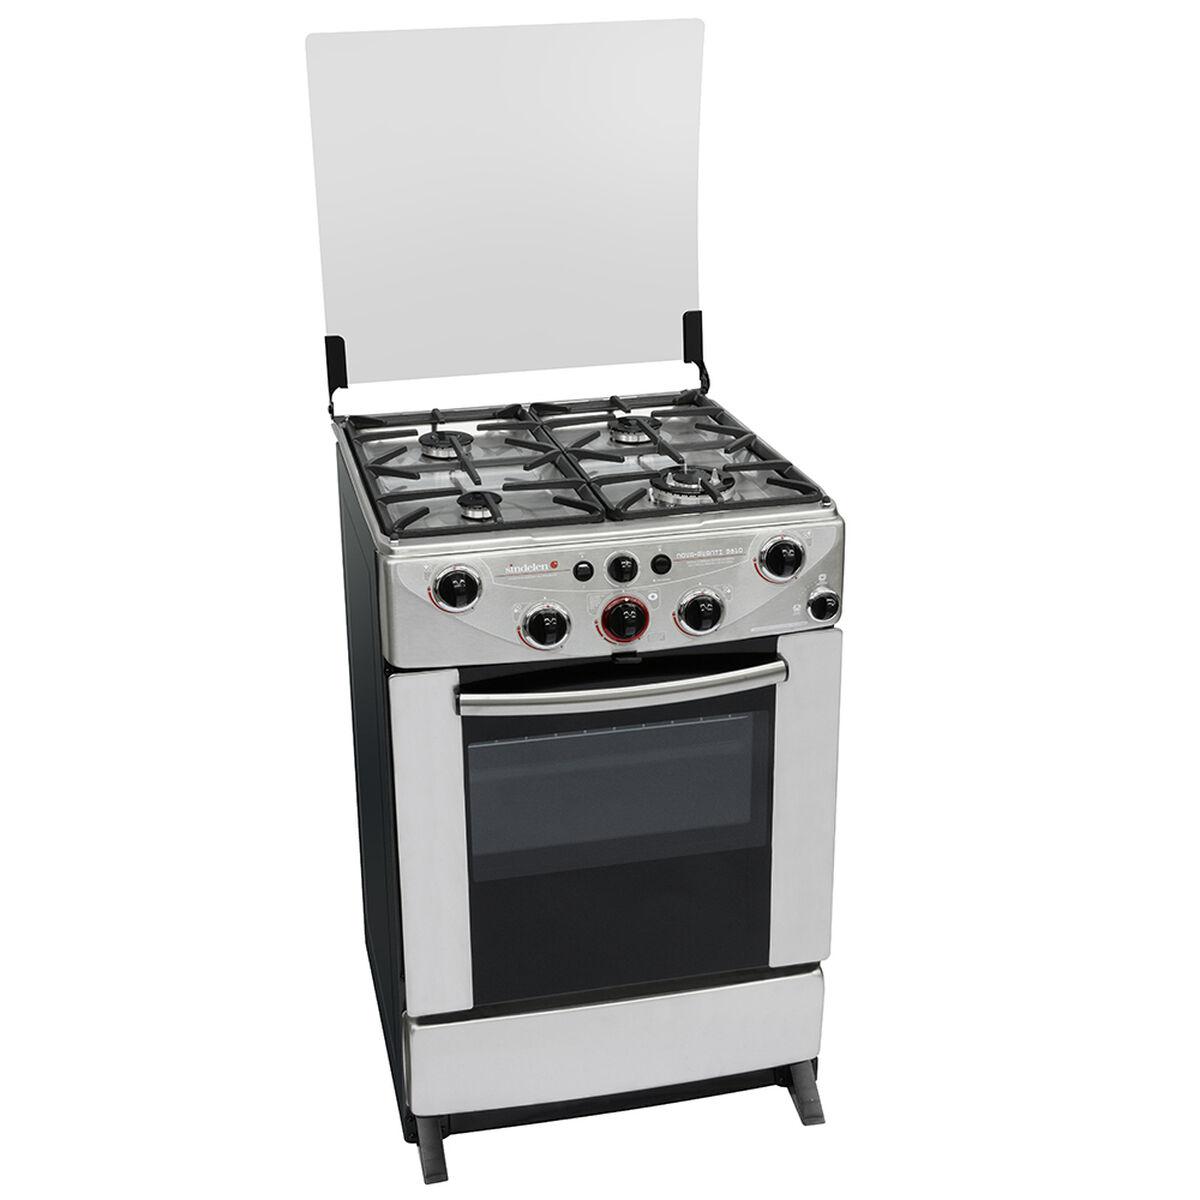 Cocina a Gas Sindelen CH 9810 68 lt